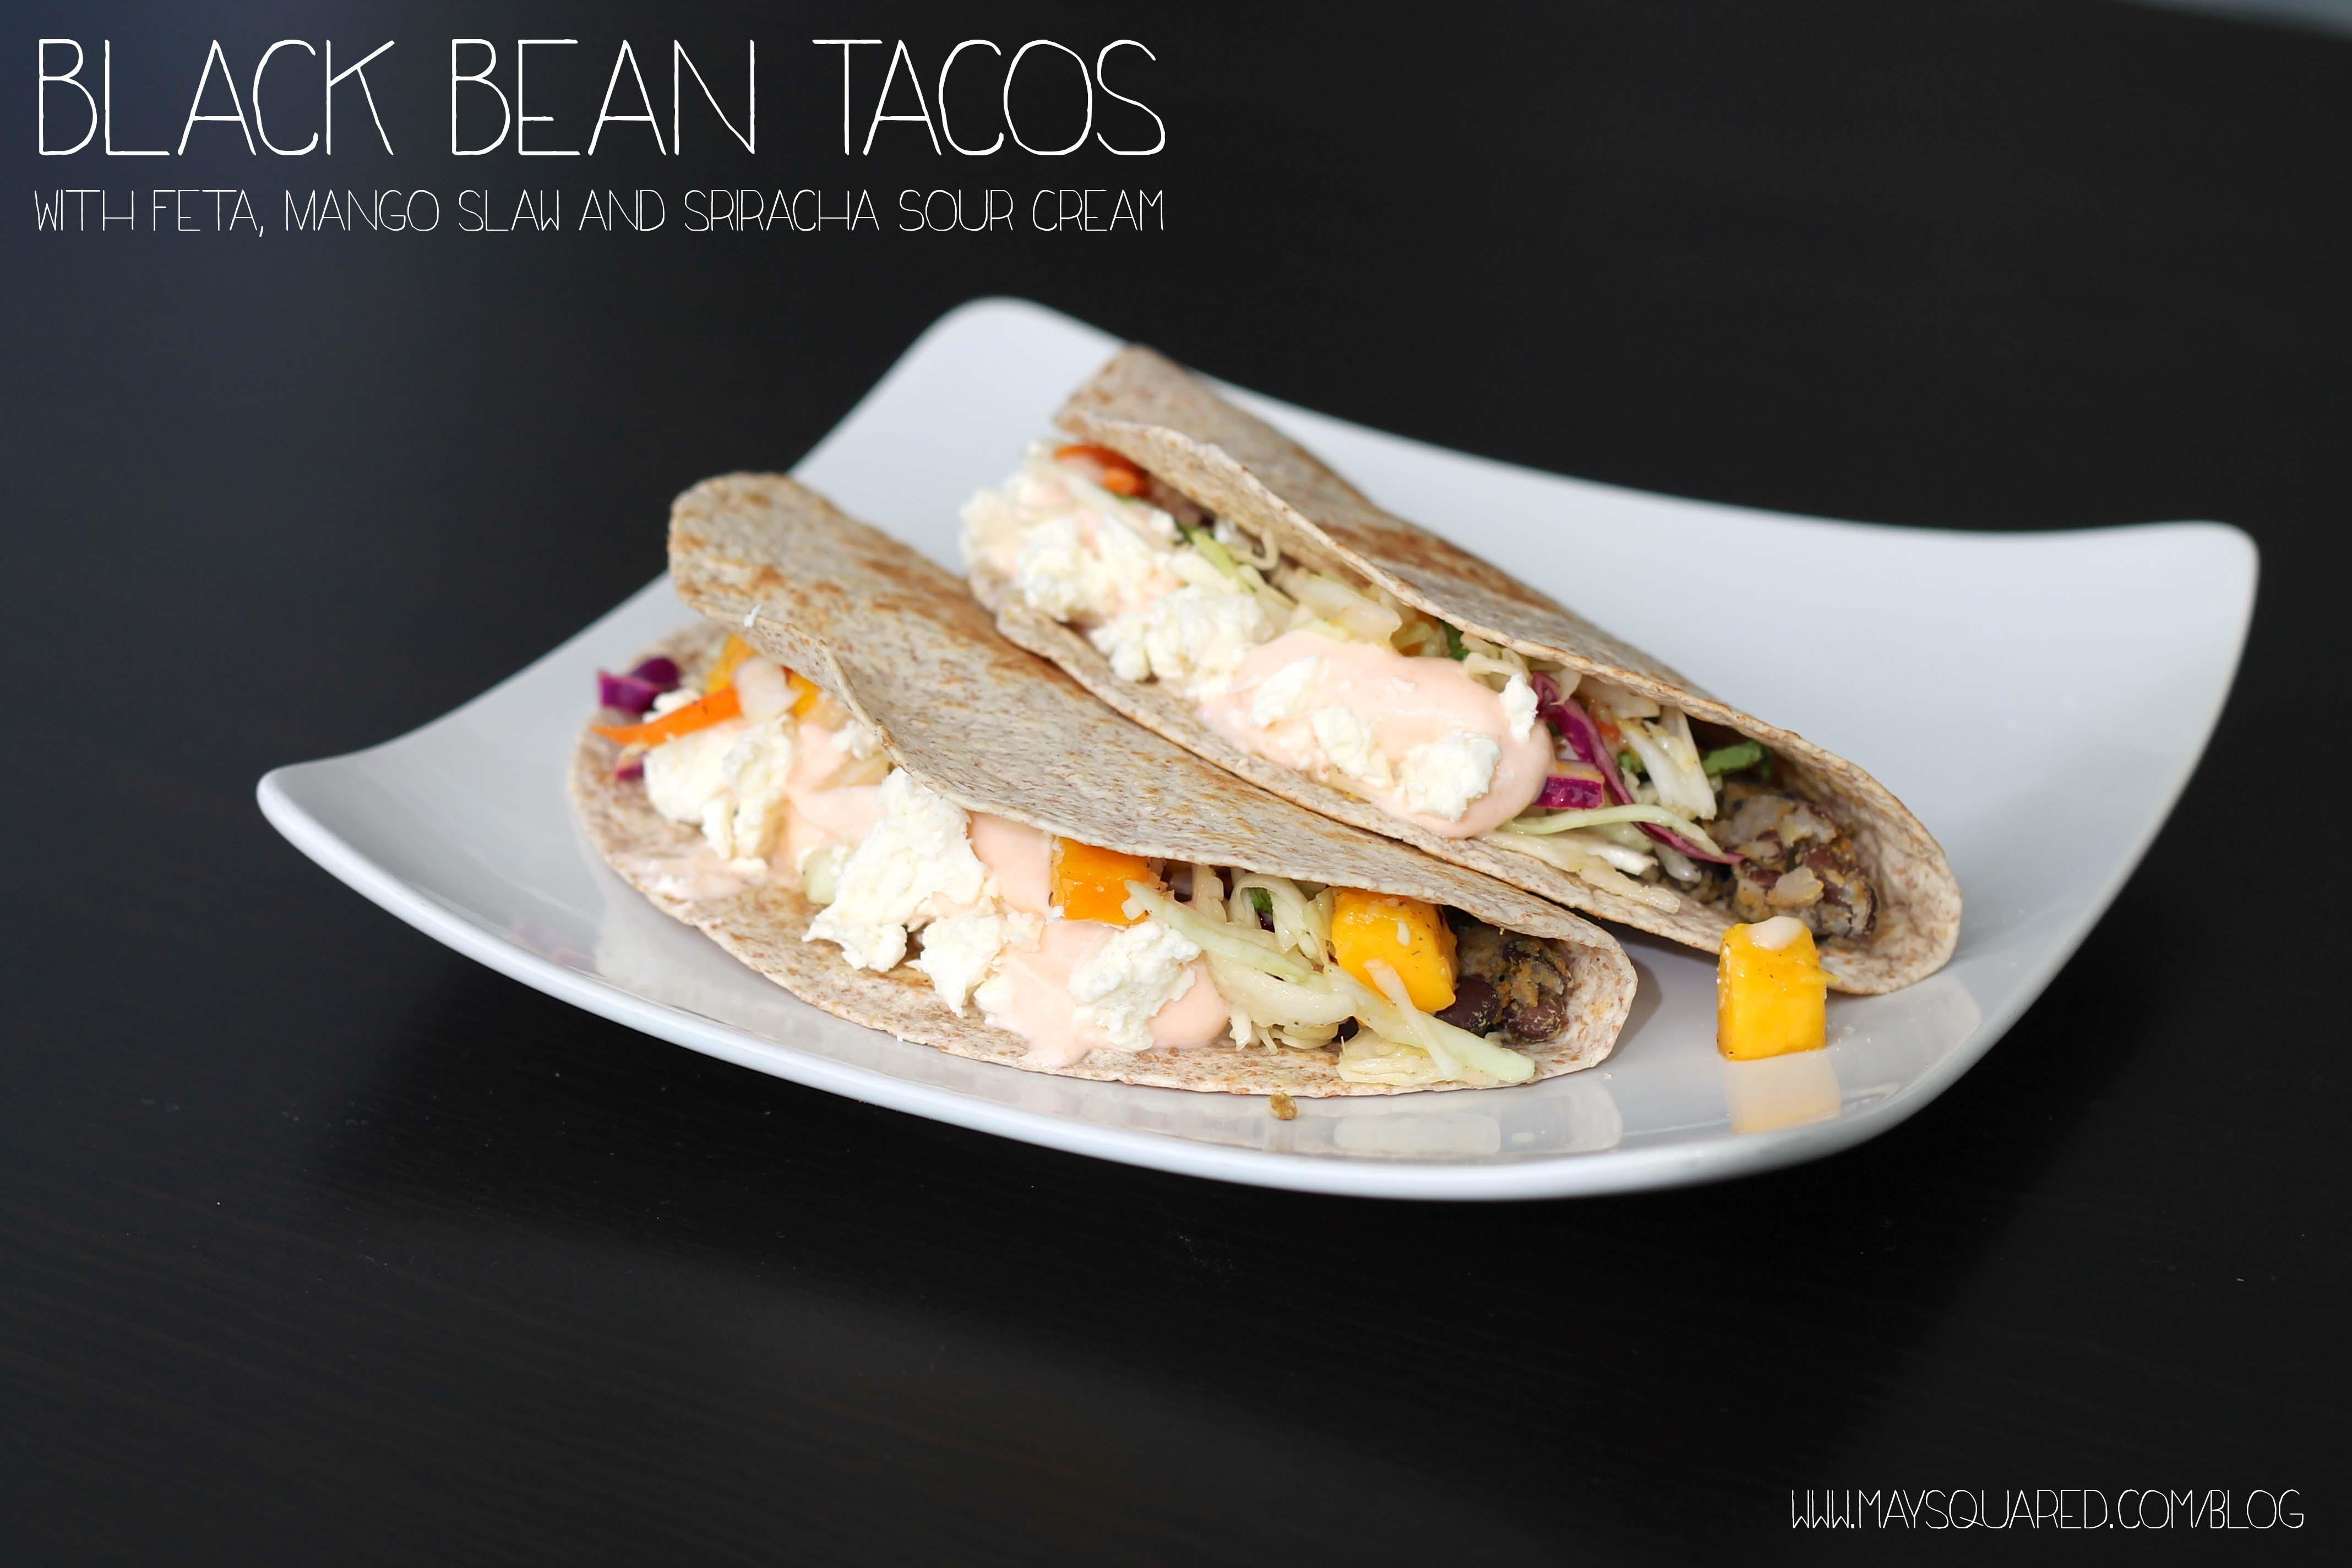 Black Bean Tacos with Feta, Mango Slaw and Sriracha Sour Cream